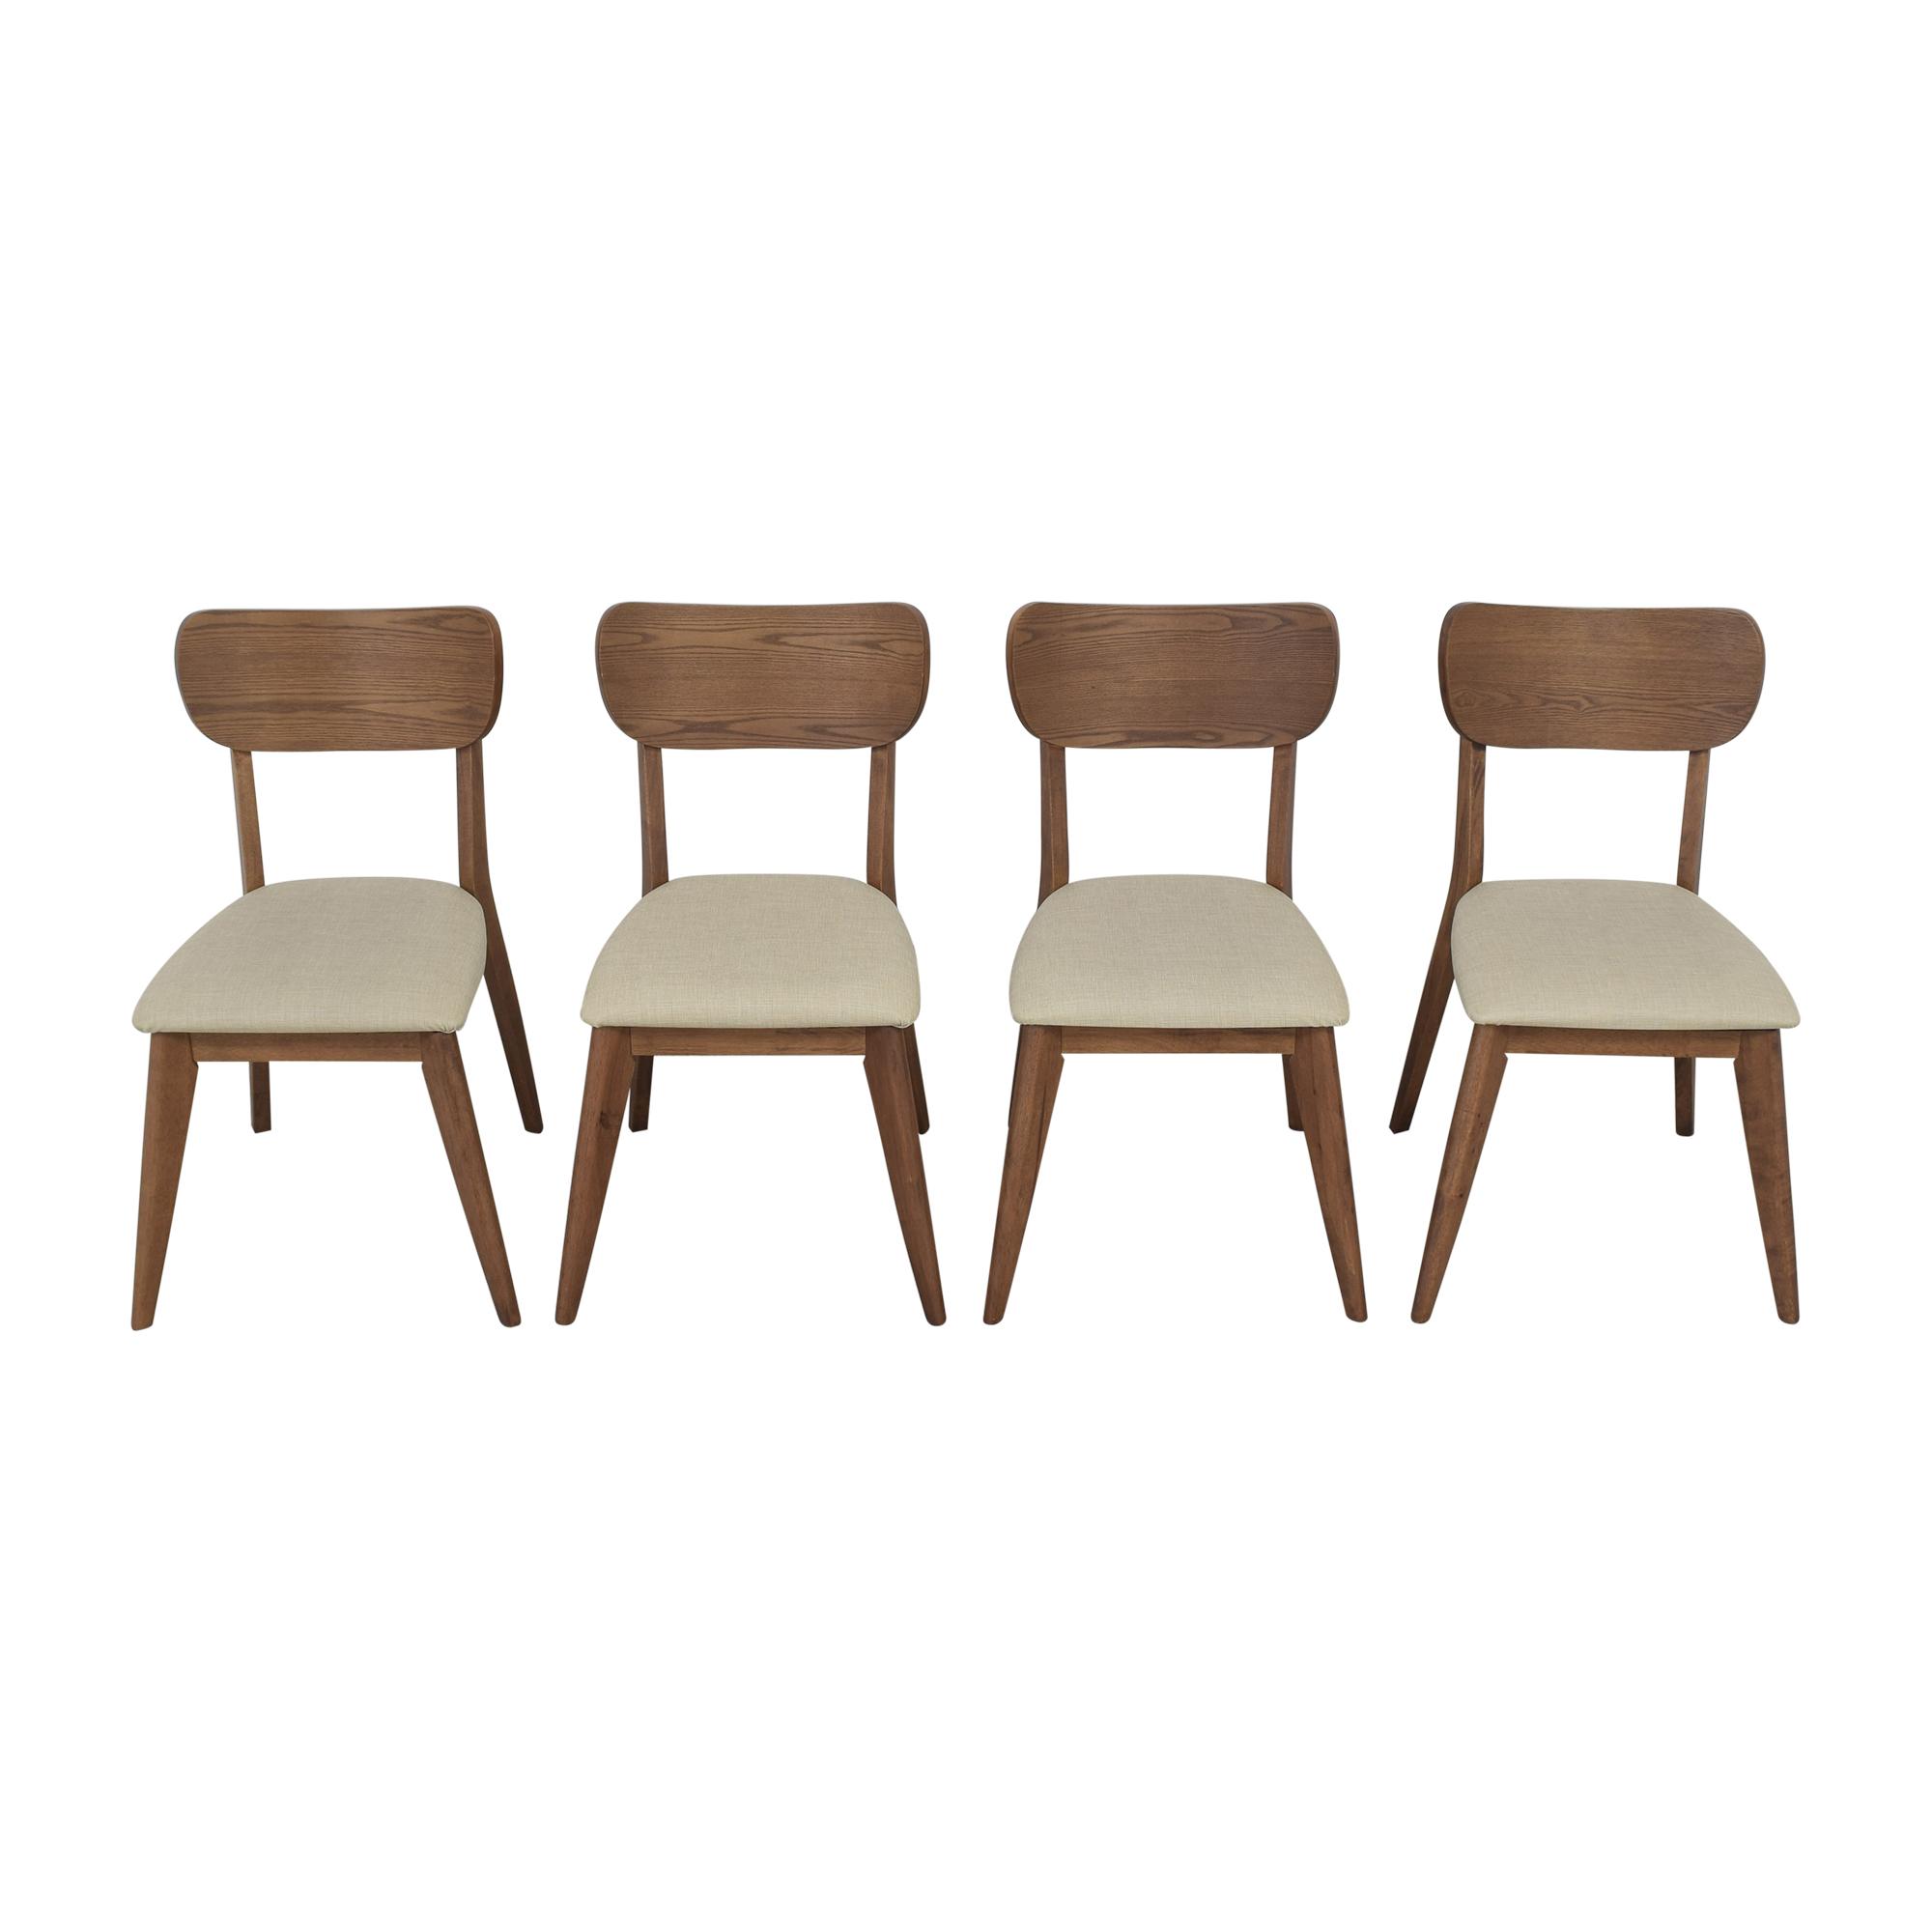 AllModern AllModern Mid-Century Modern Style Dining Chairs Chairs